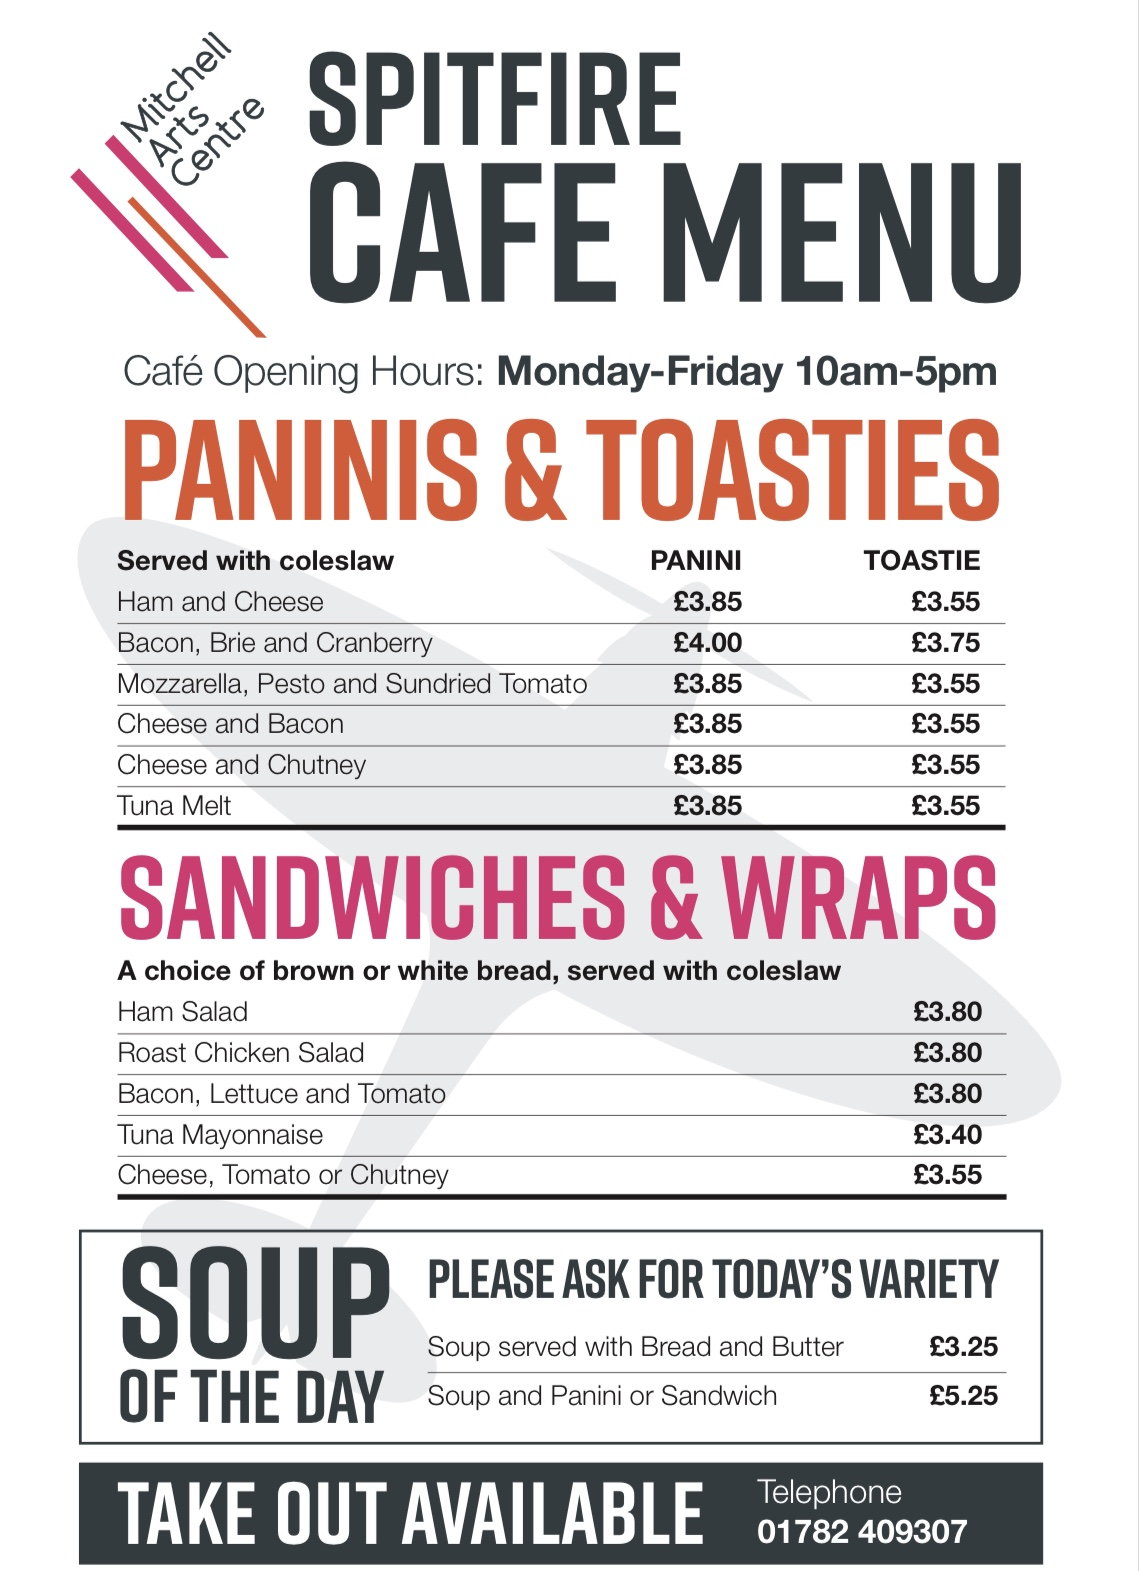 Spitfire cafe menu